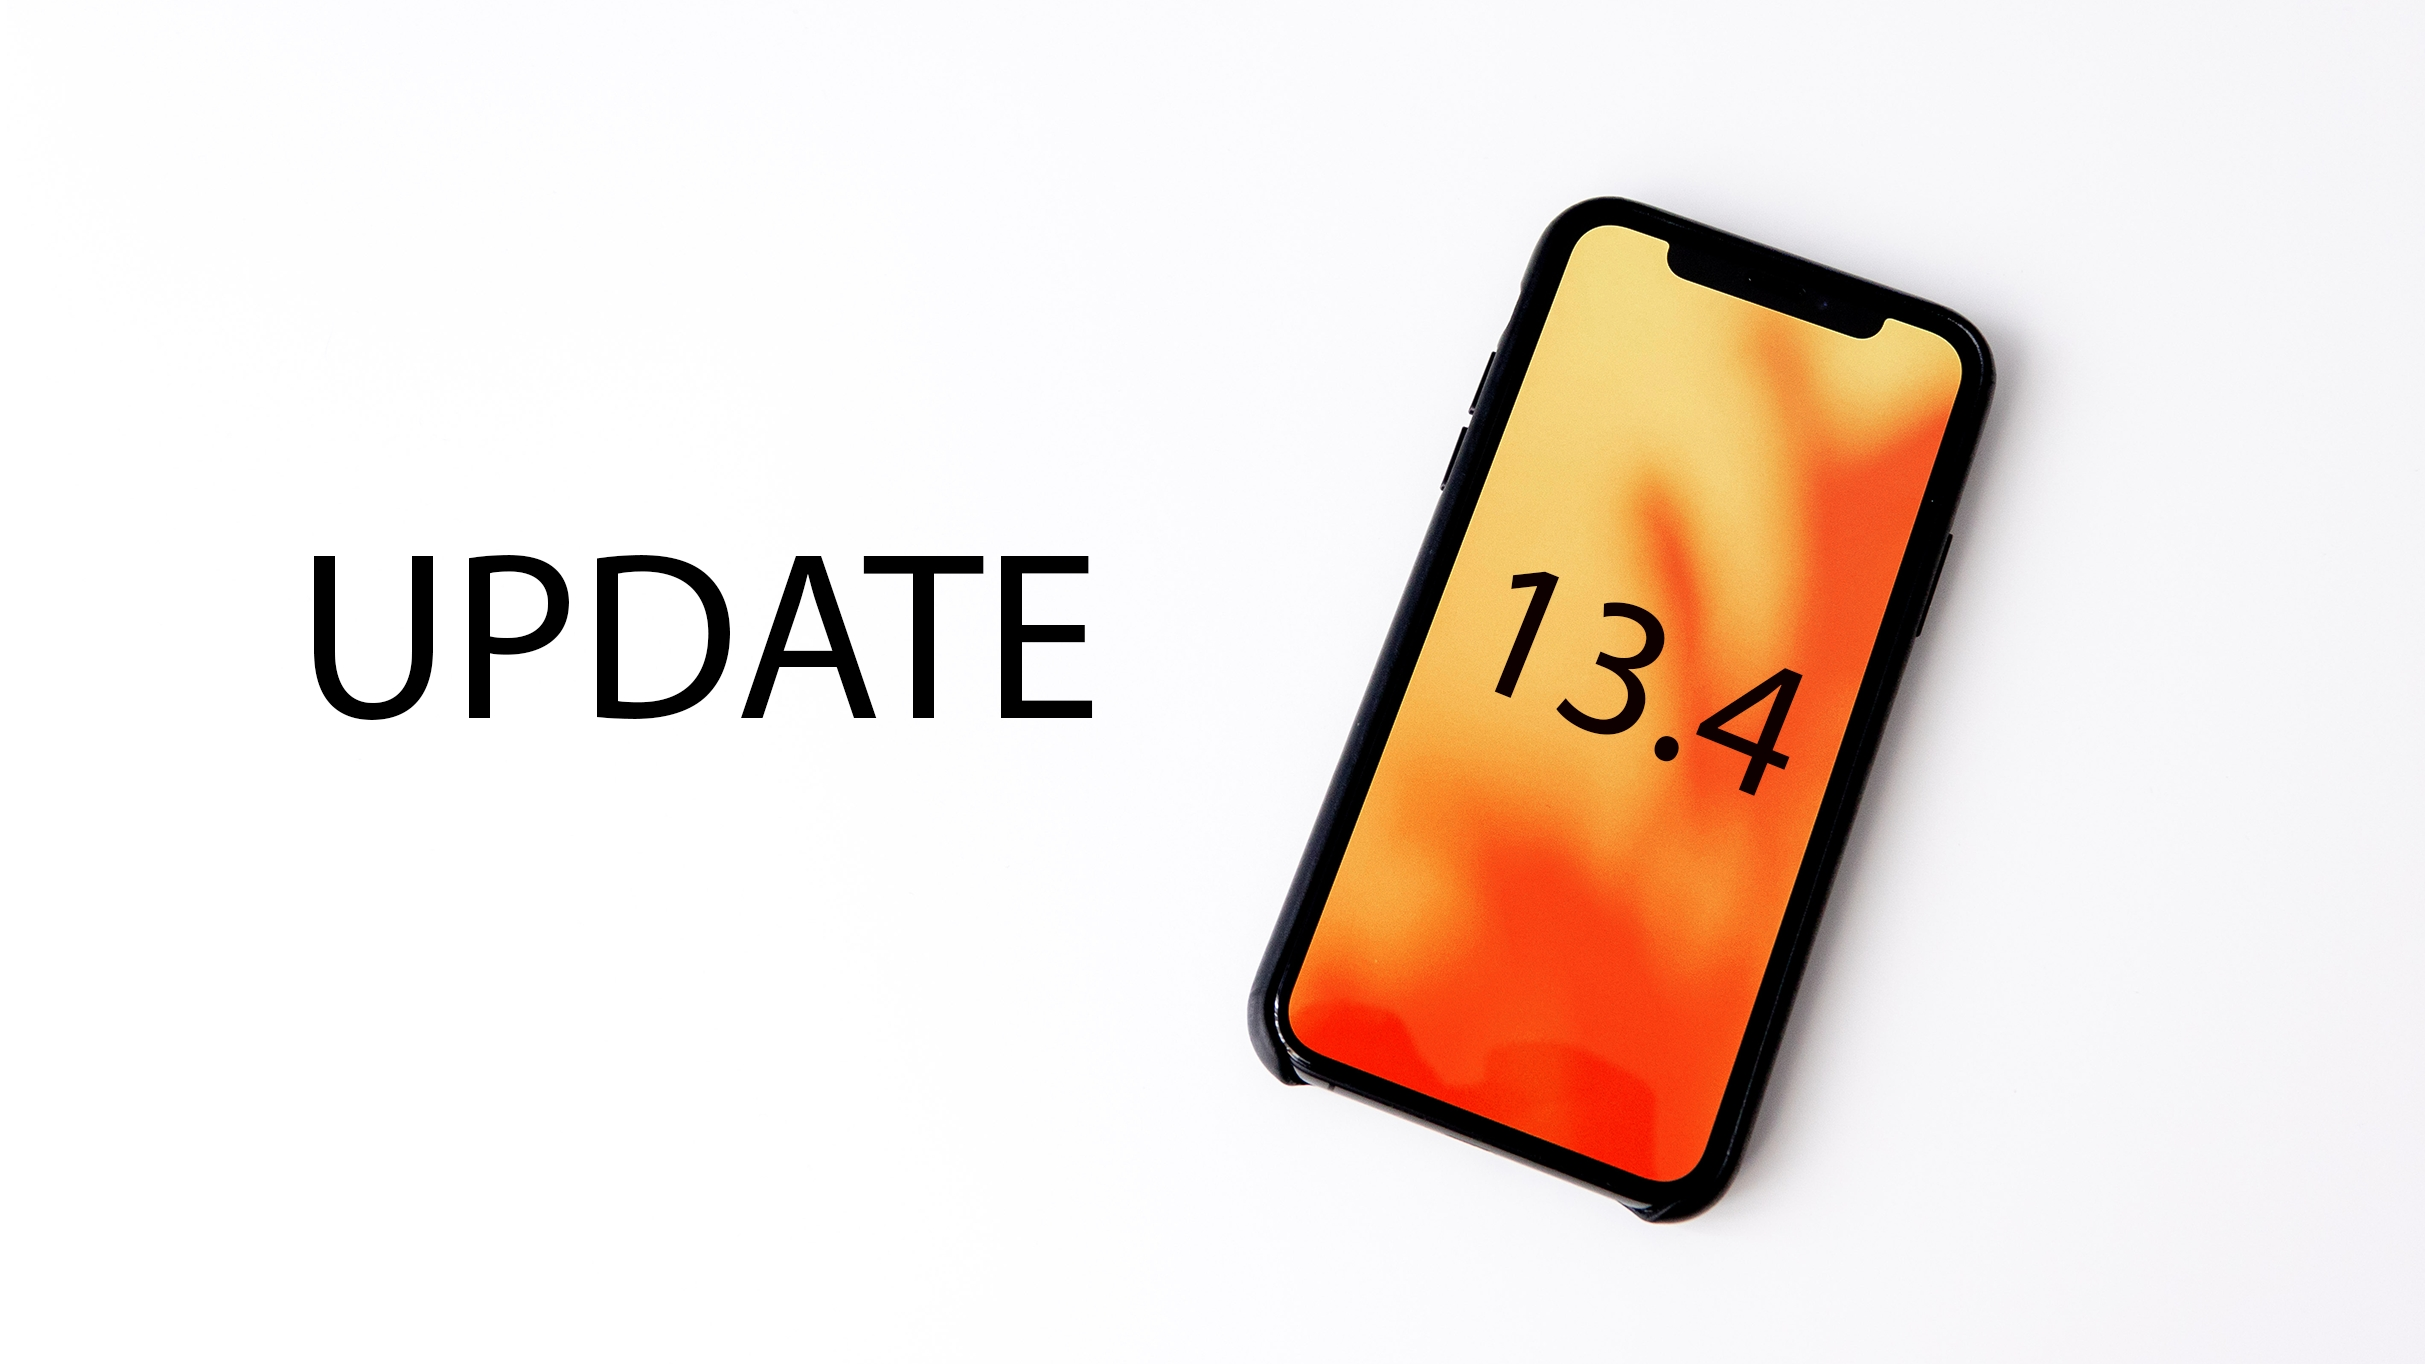 Apple právě vydal iOS 13.4 a iPadOS 13.4